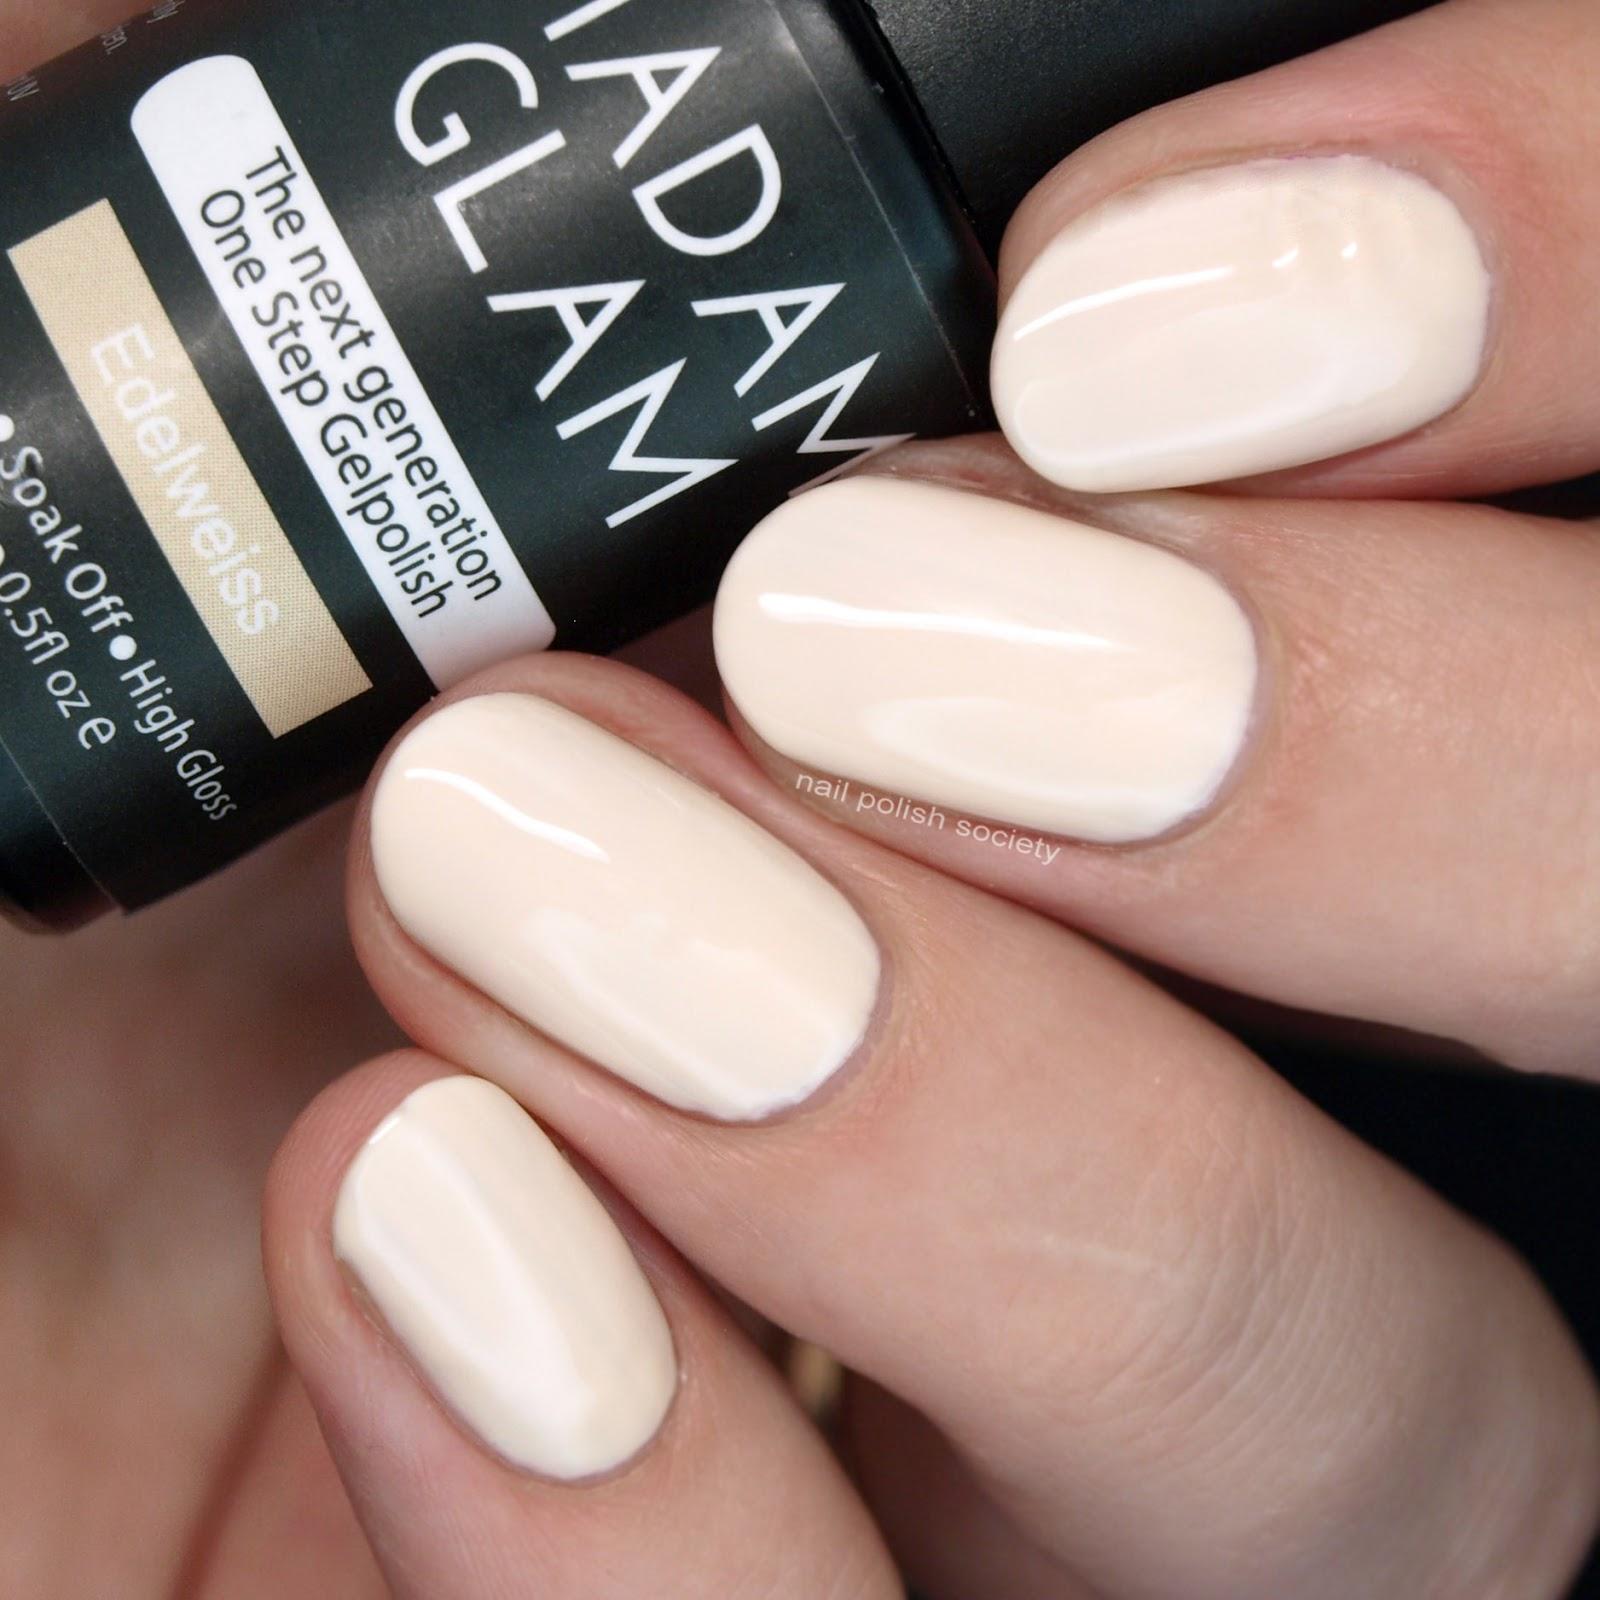 Nail Polish Society: Madam Glam One-Step Gel Polish Swatch and Review